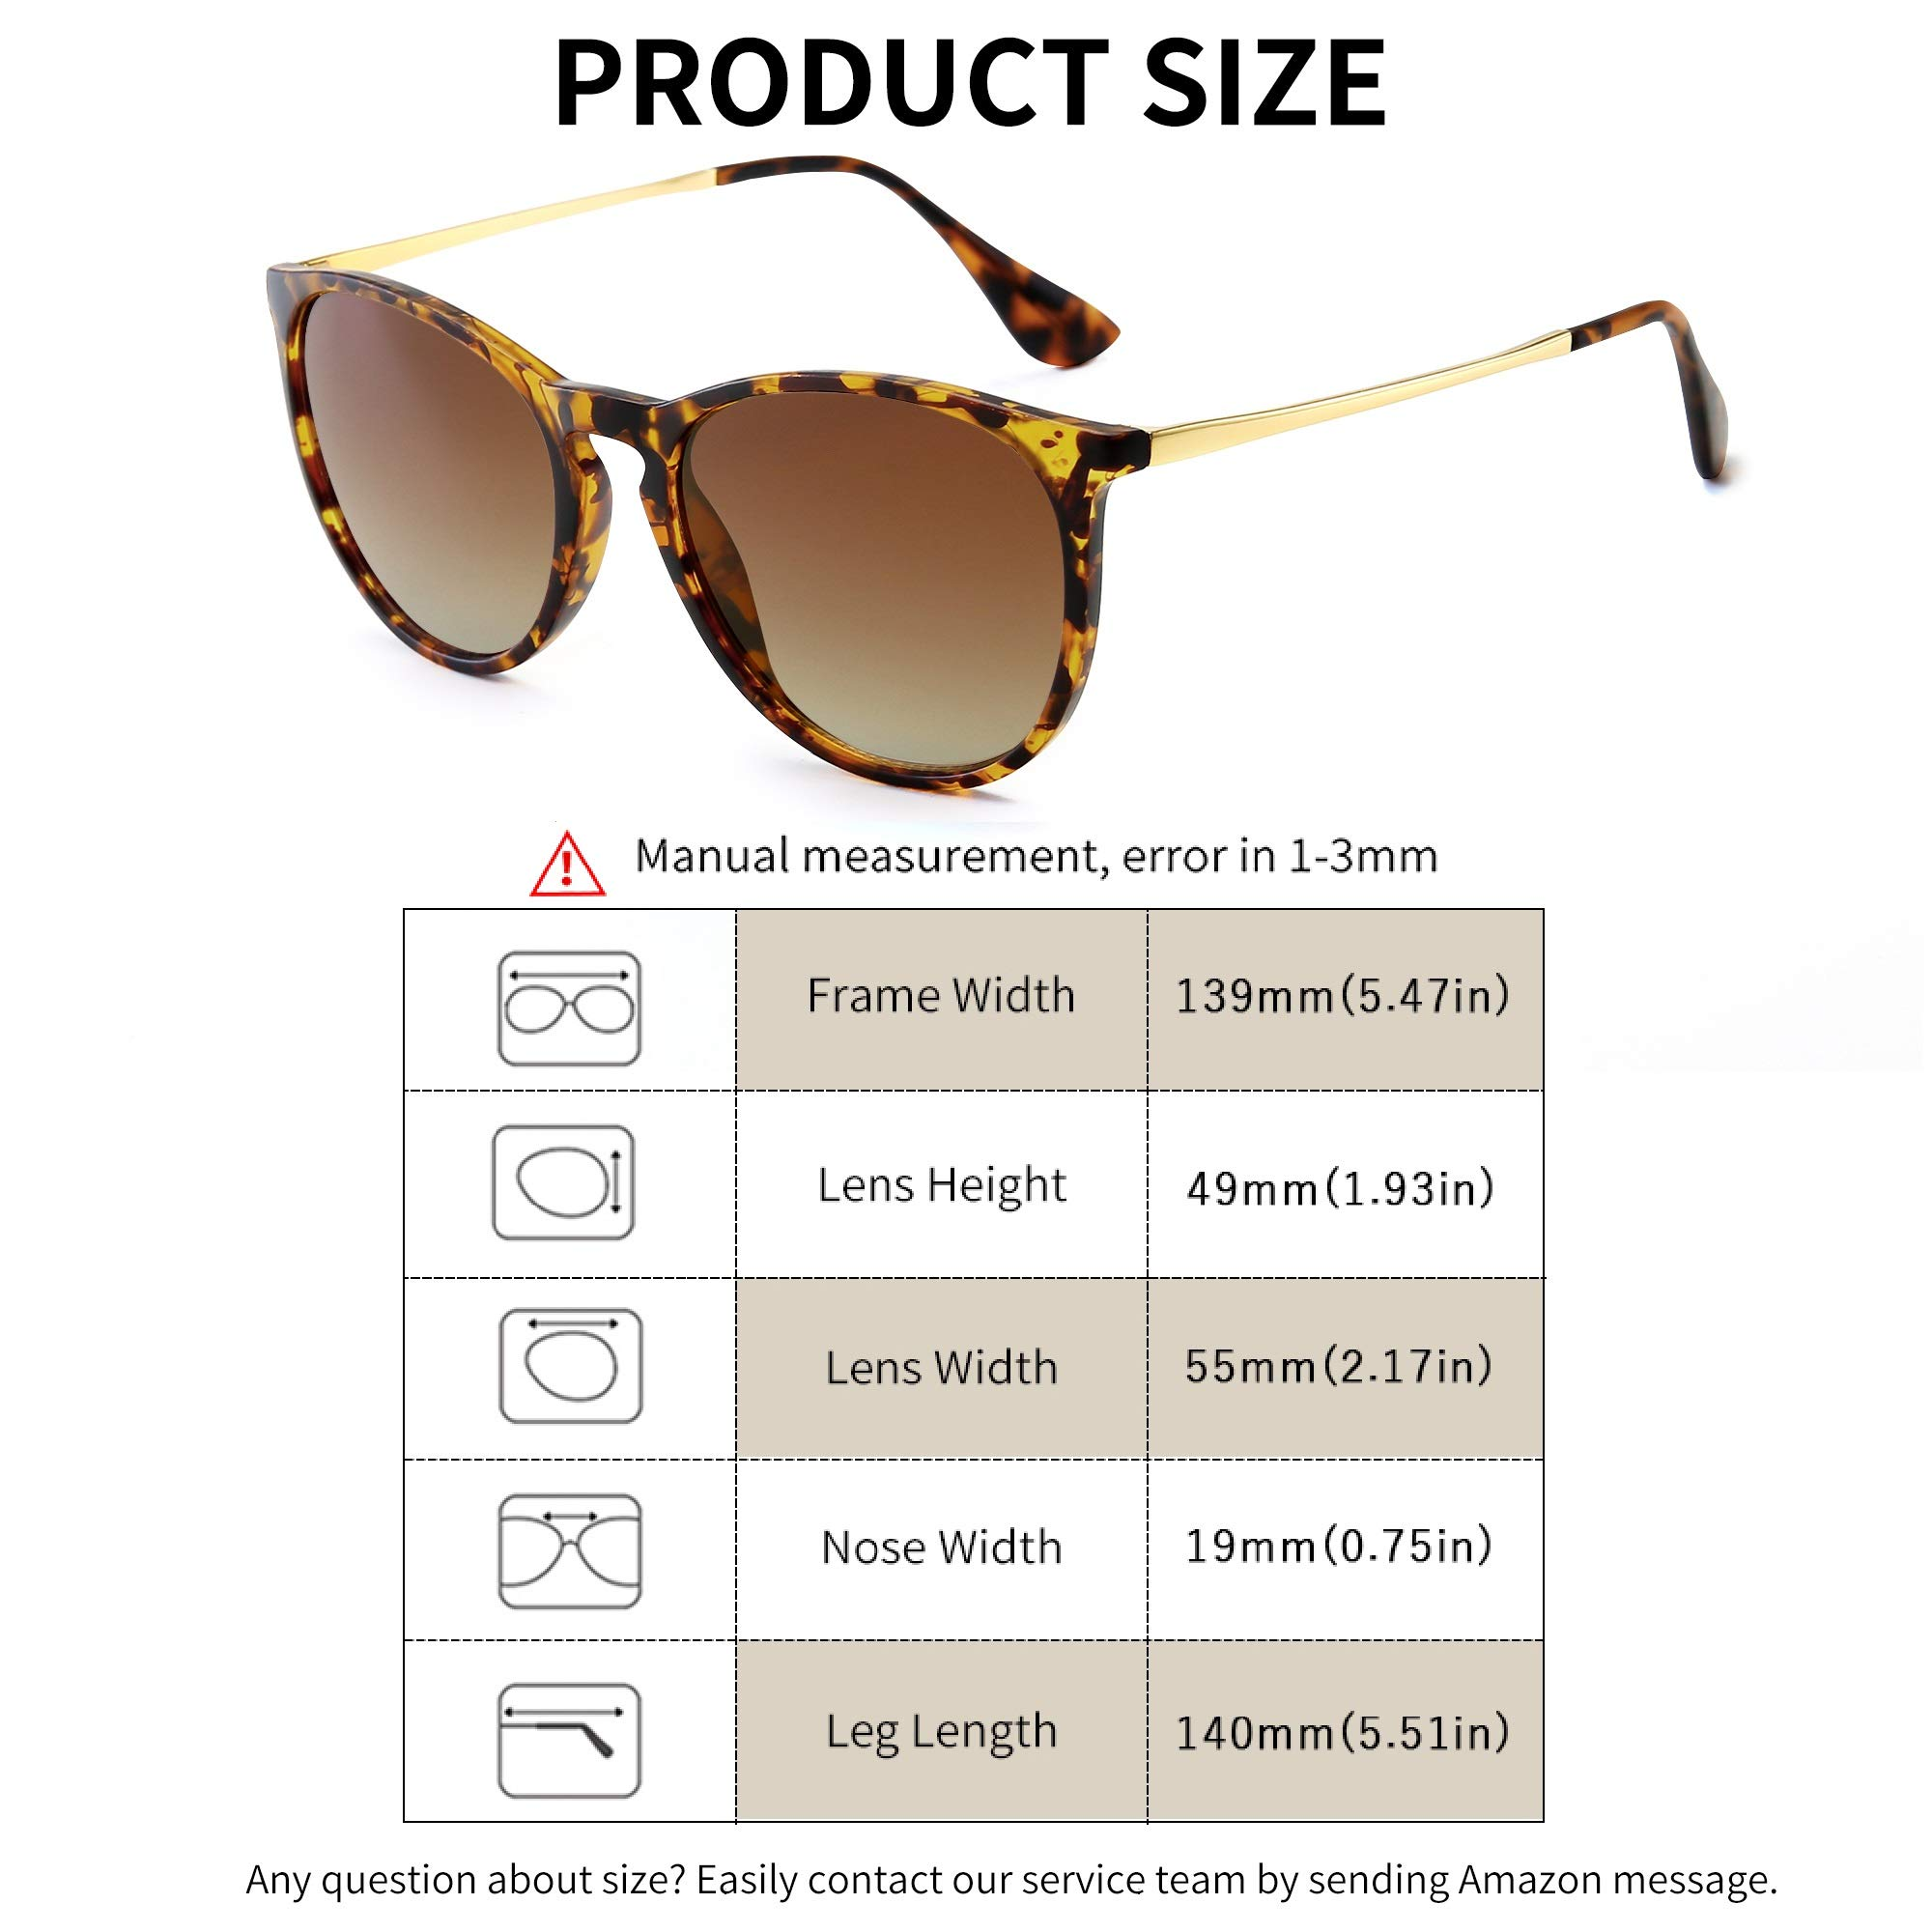 SUNGAIT Vintage Round Sunglasses for Women Girl Classic Retro Designer Style (Amber Frame(Matte Finish)/Brown Gradient Lens) 1567HPKCUK